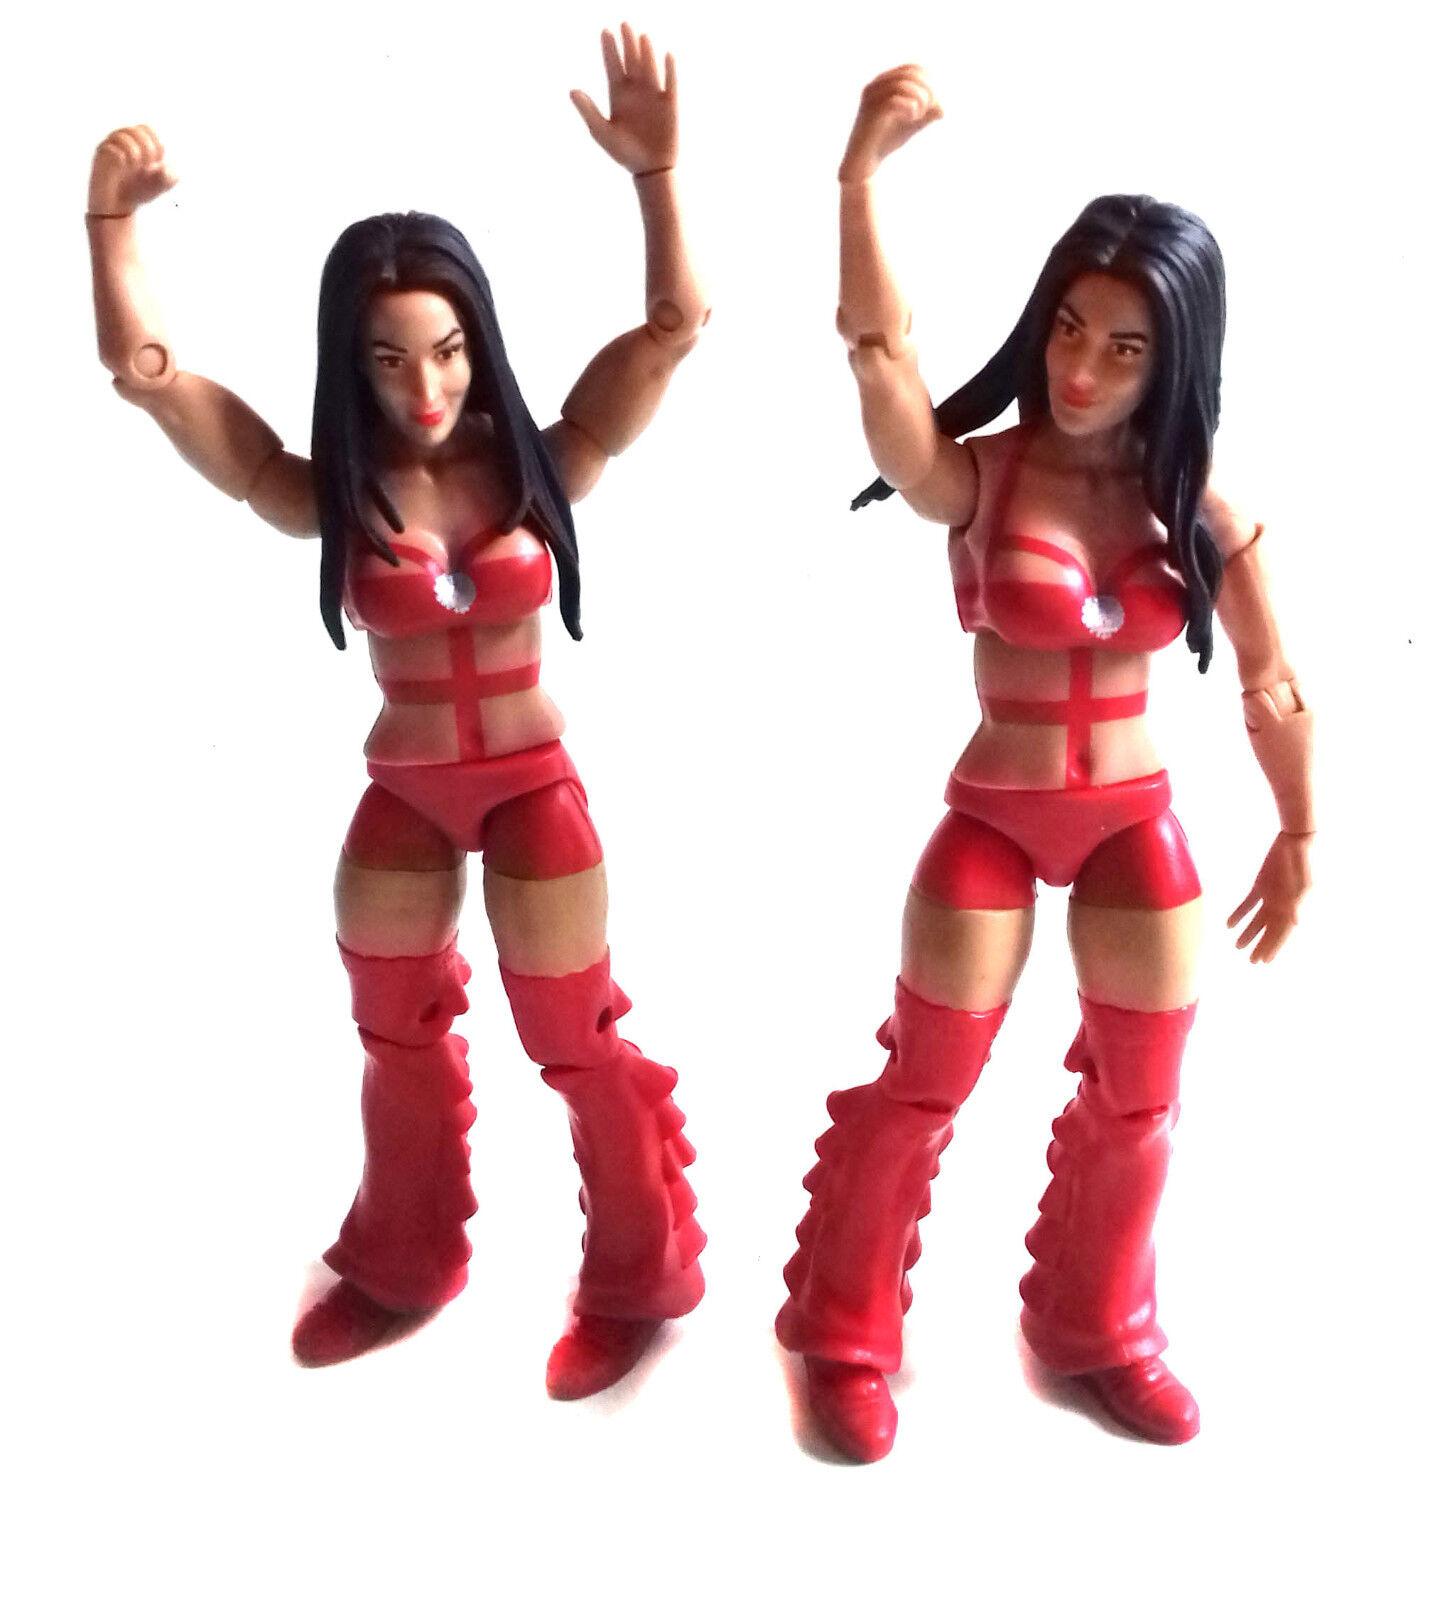 WWF WWE TNA Wrestling Brie and Nikki Bella Mattel Elite Elite Elite  6  toy figures RARE 0bcb14